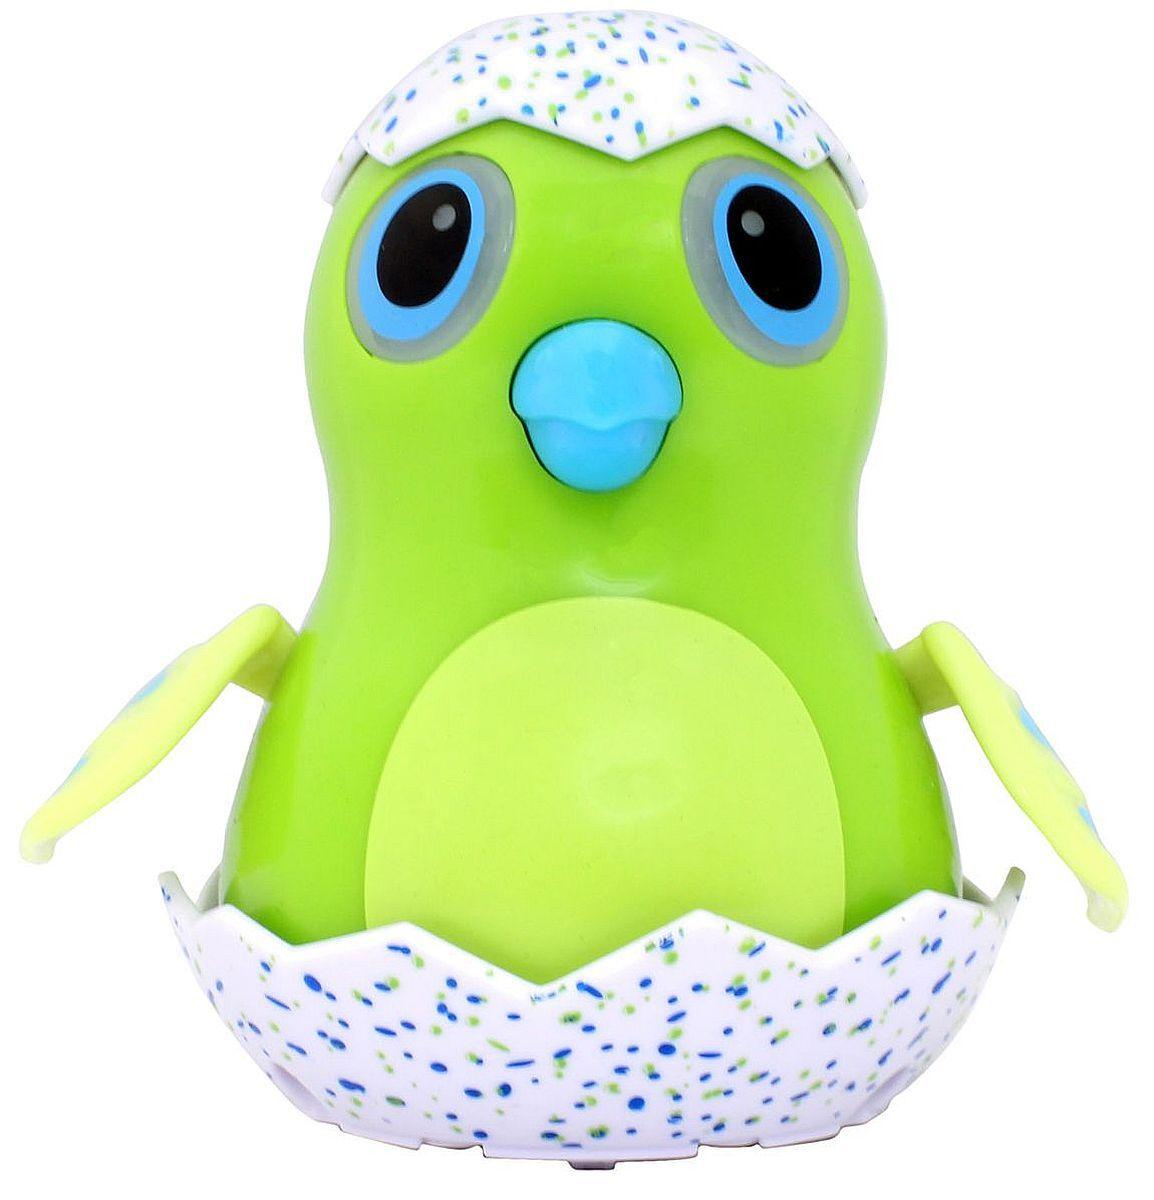 Детска играчка Spin Master Hatchimals - Зелено пиле, със звук и светлина - 1